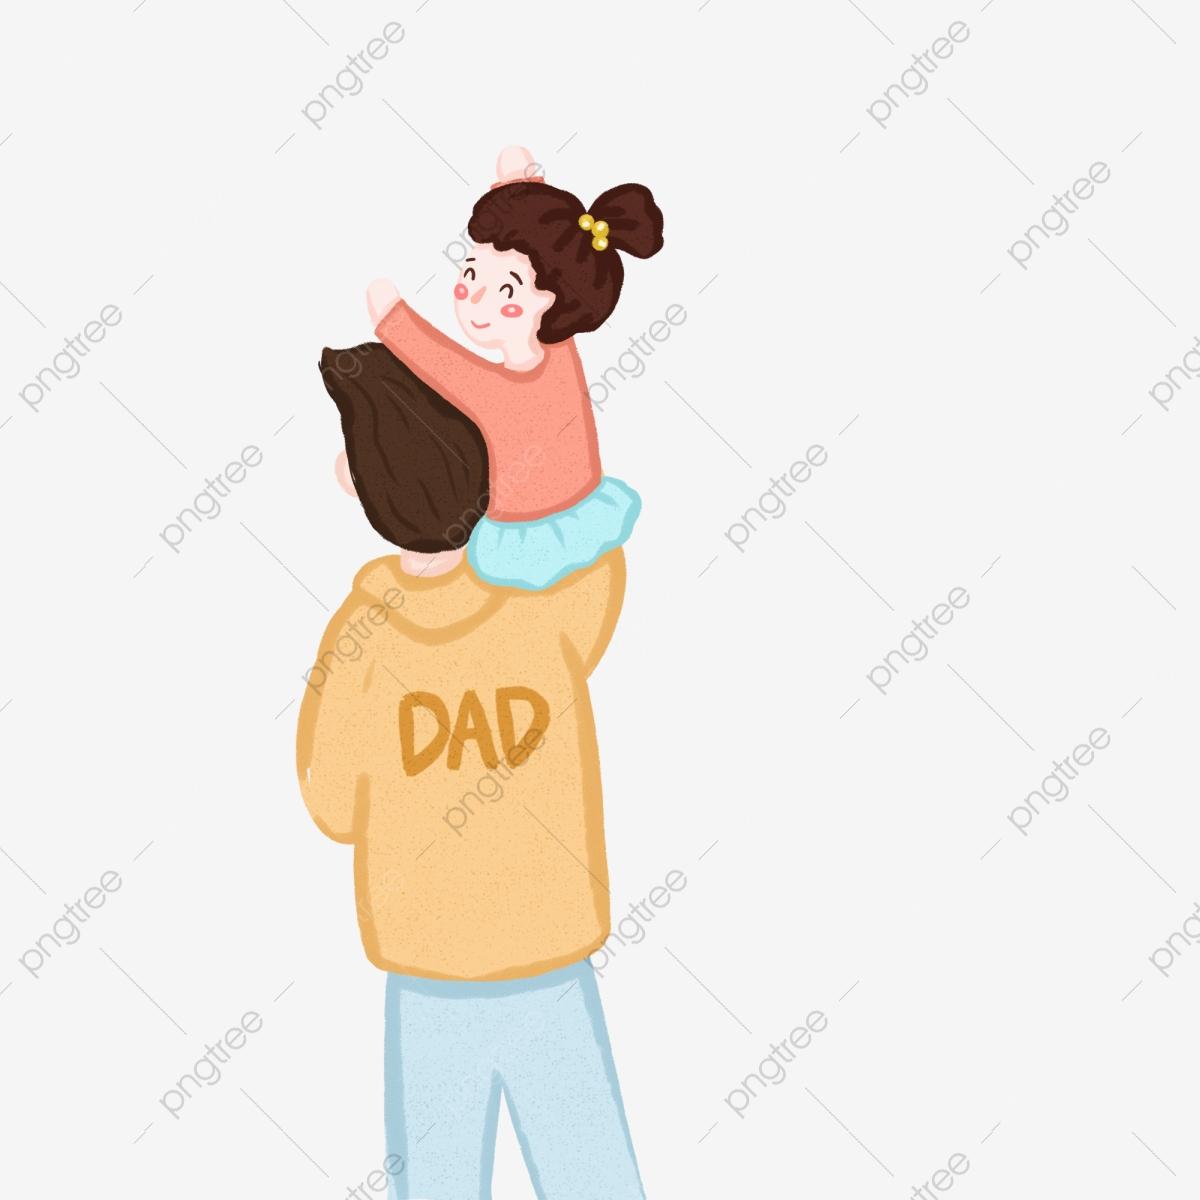 dad and missu image